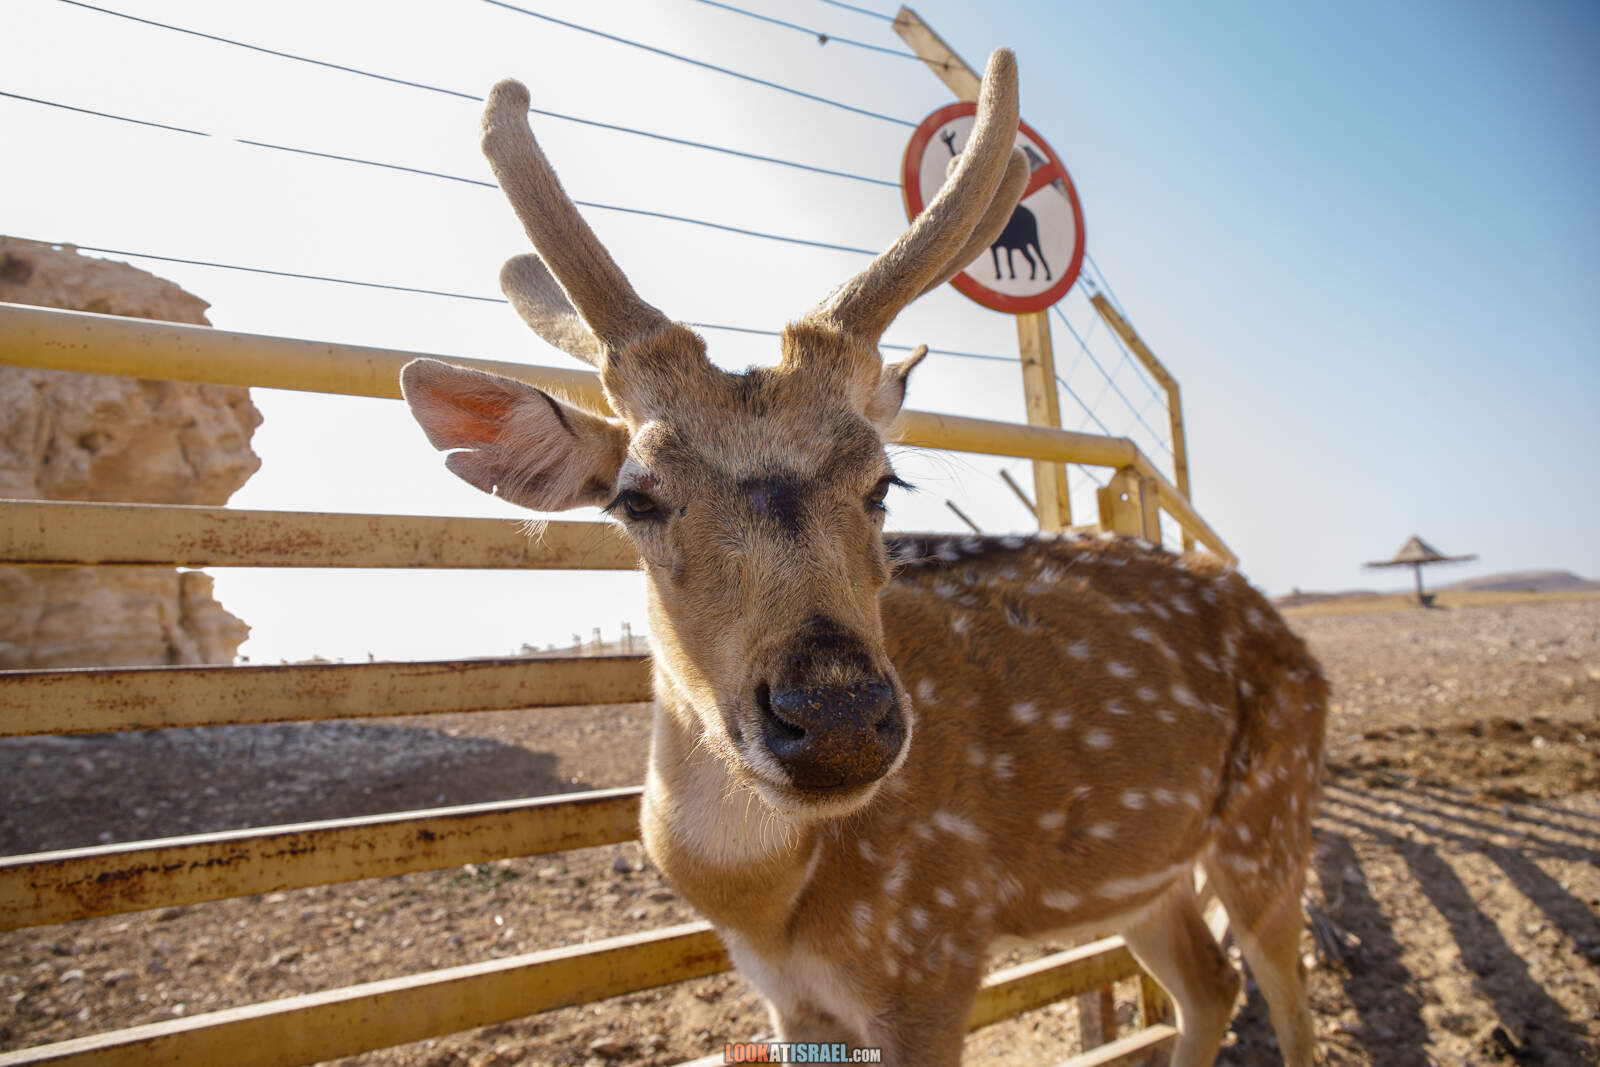 Африка в Израиле - Ферма ранчо антилоп в Араве | Antеlope ranch in Arava | חוות האנטיליפות בערבה | LookAtIsrael.com - Фото путешествия по Израилю